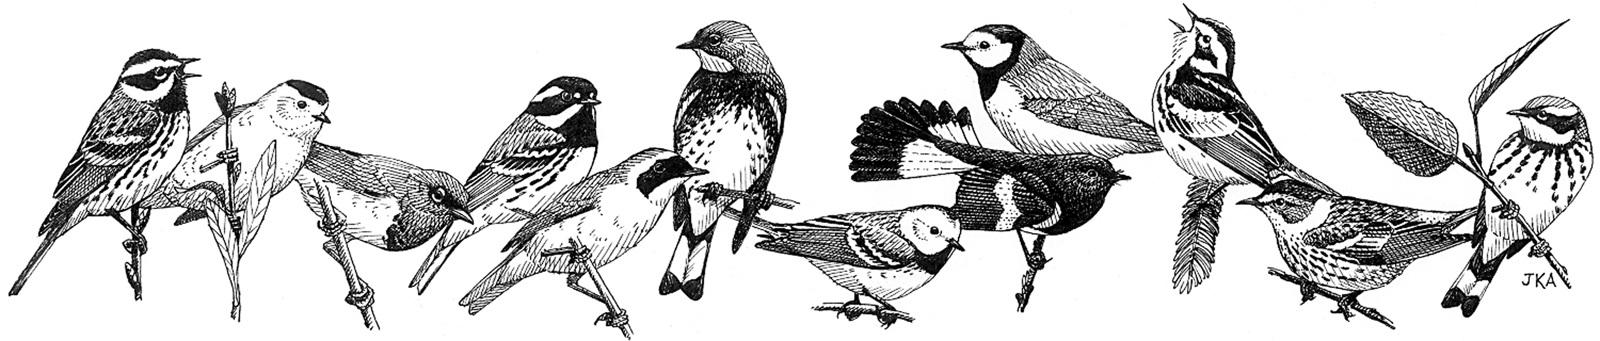 BOS-Banner-12+birds.jpg